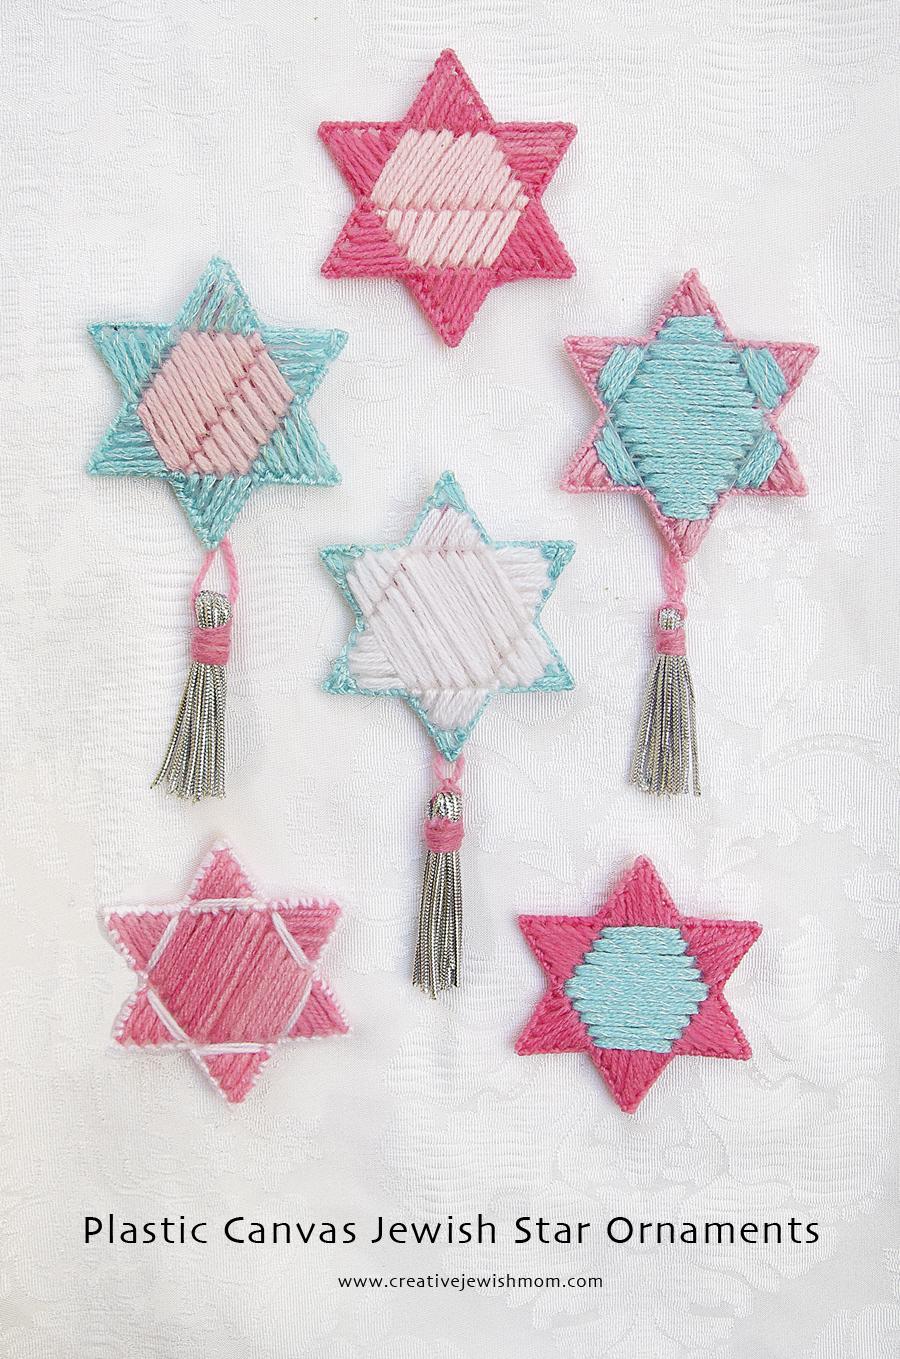 creative jewish mom: Crafts: Embroidery